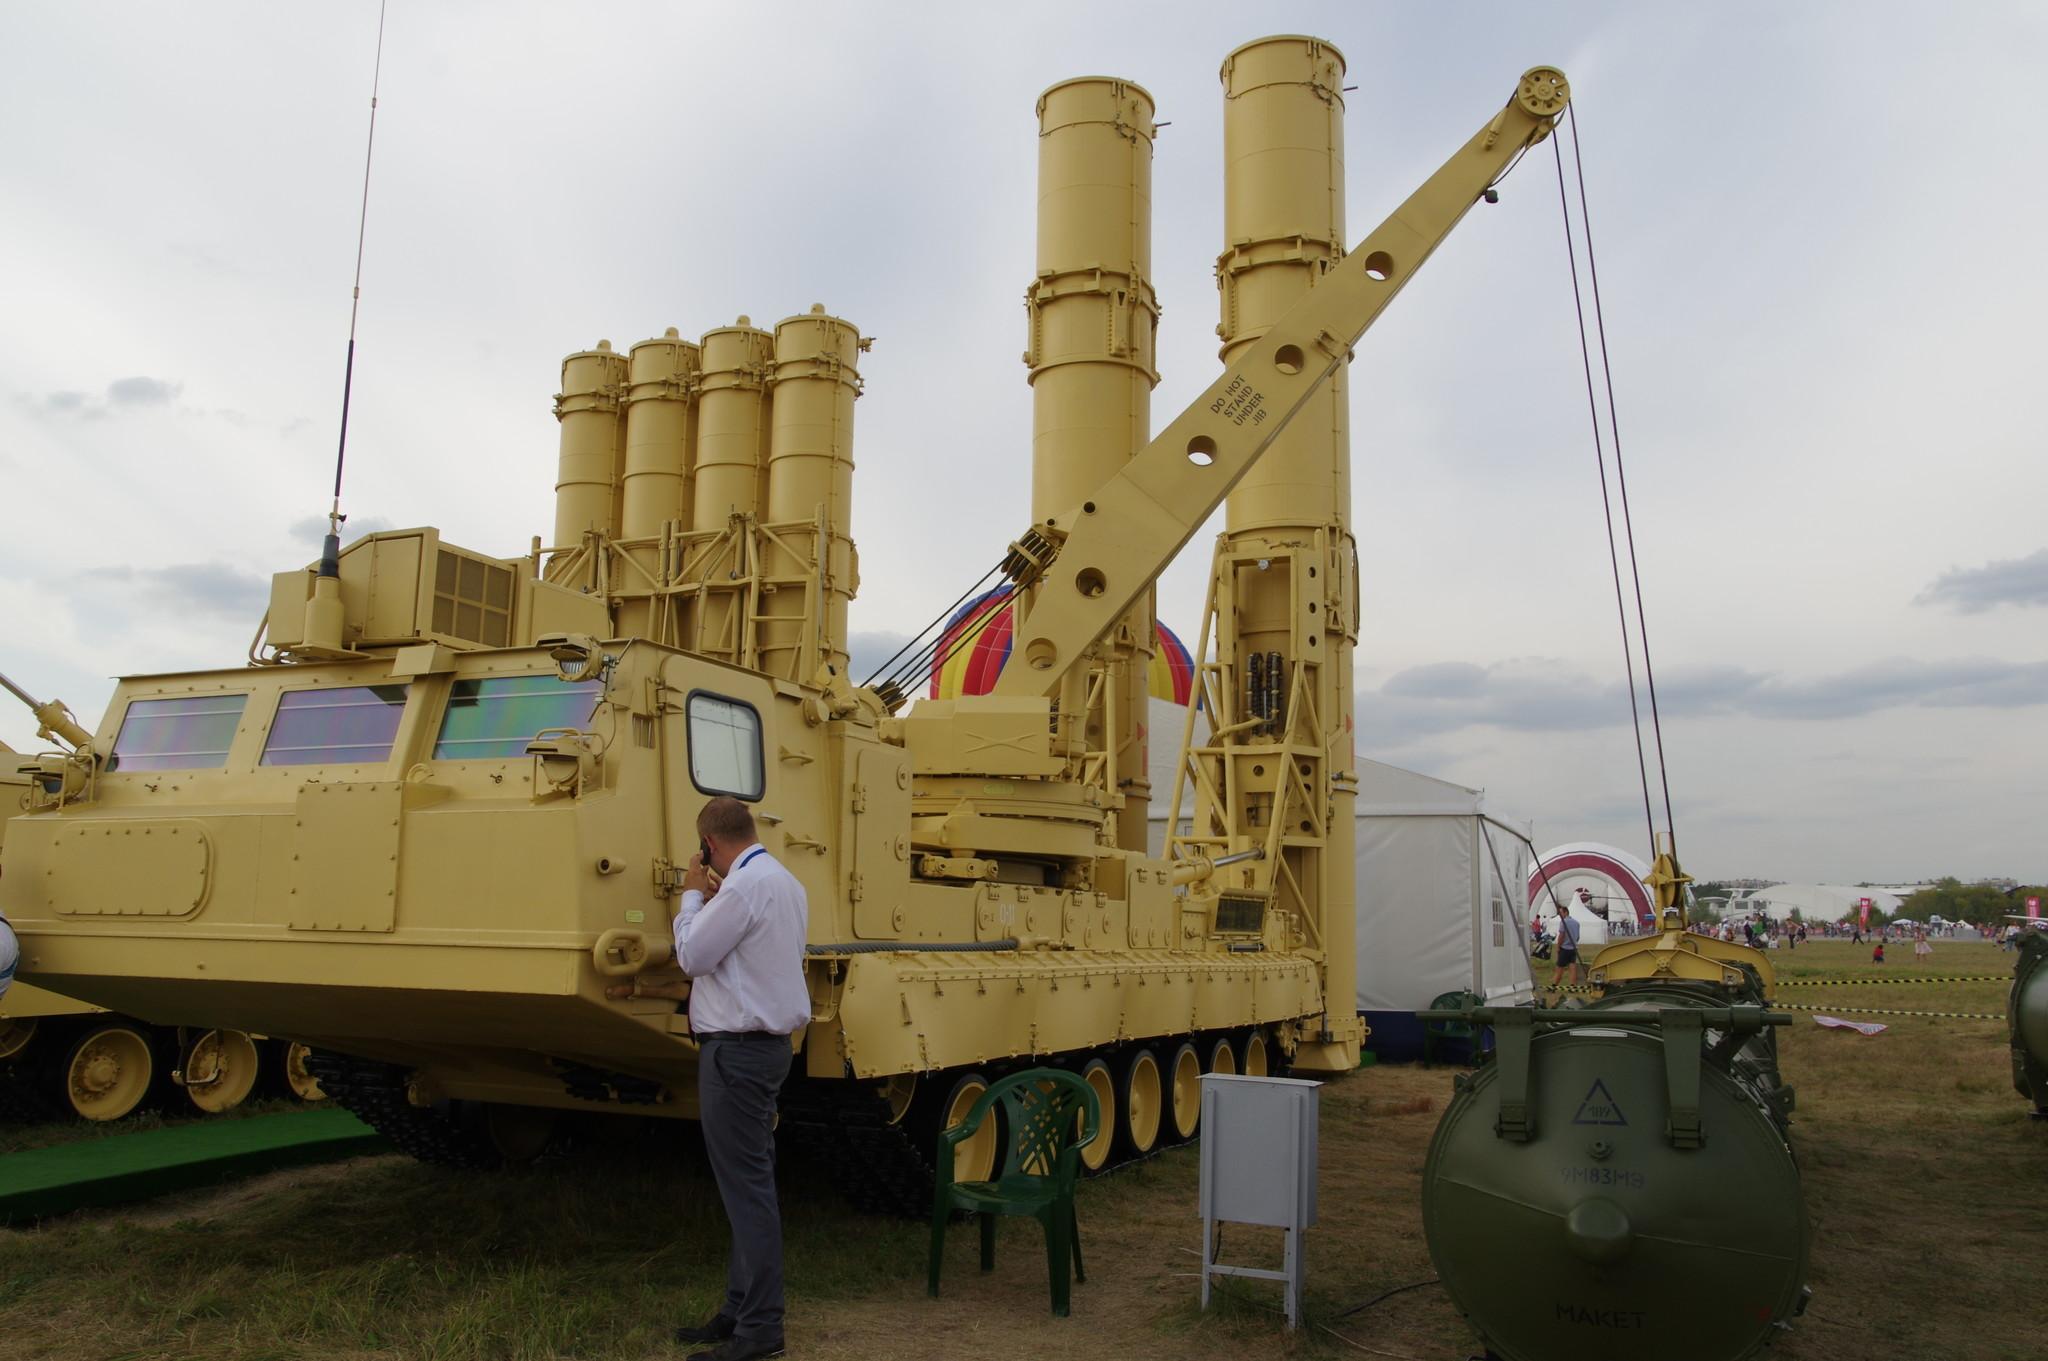 Пускозаряжающая установка ПЗУ 9А84МЭ из состава ЗРС «Антей-2500»